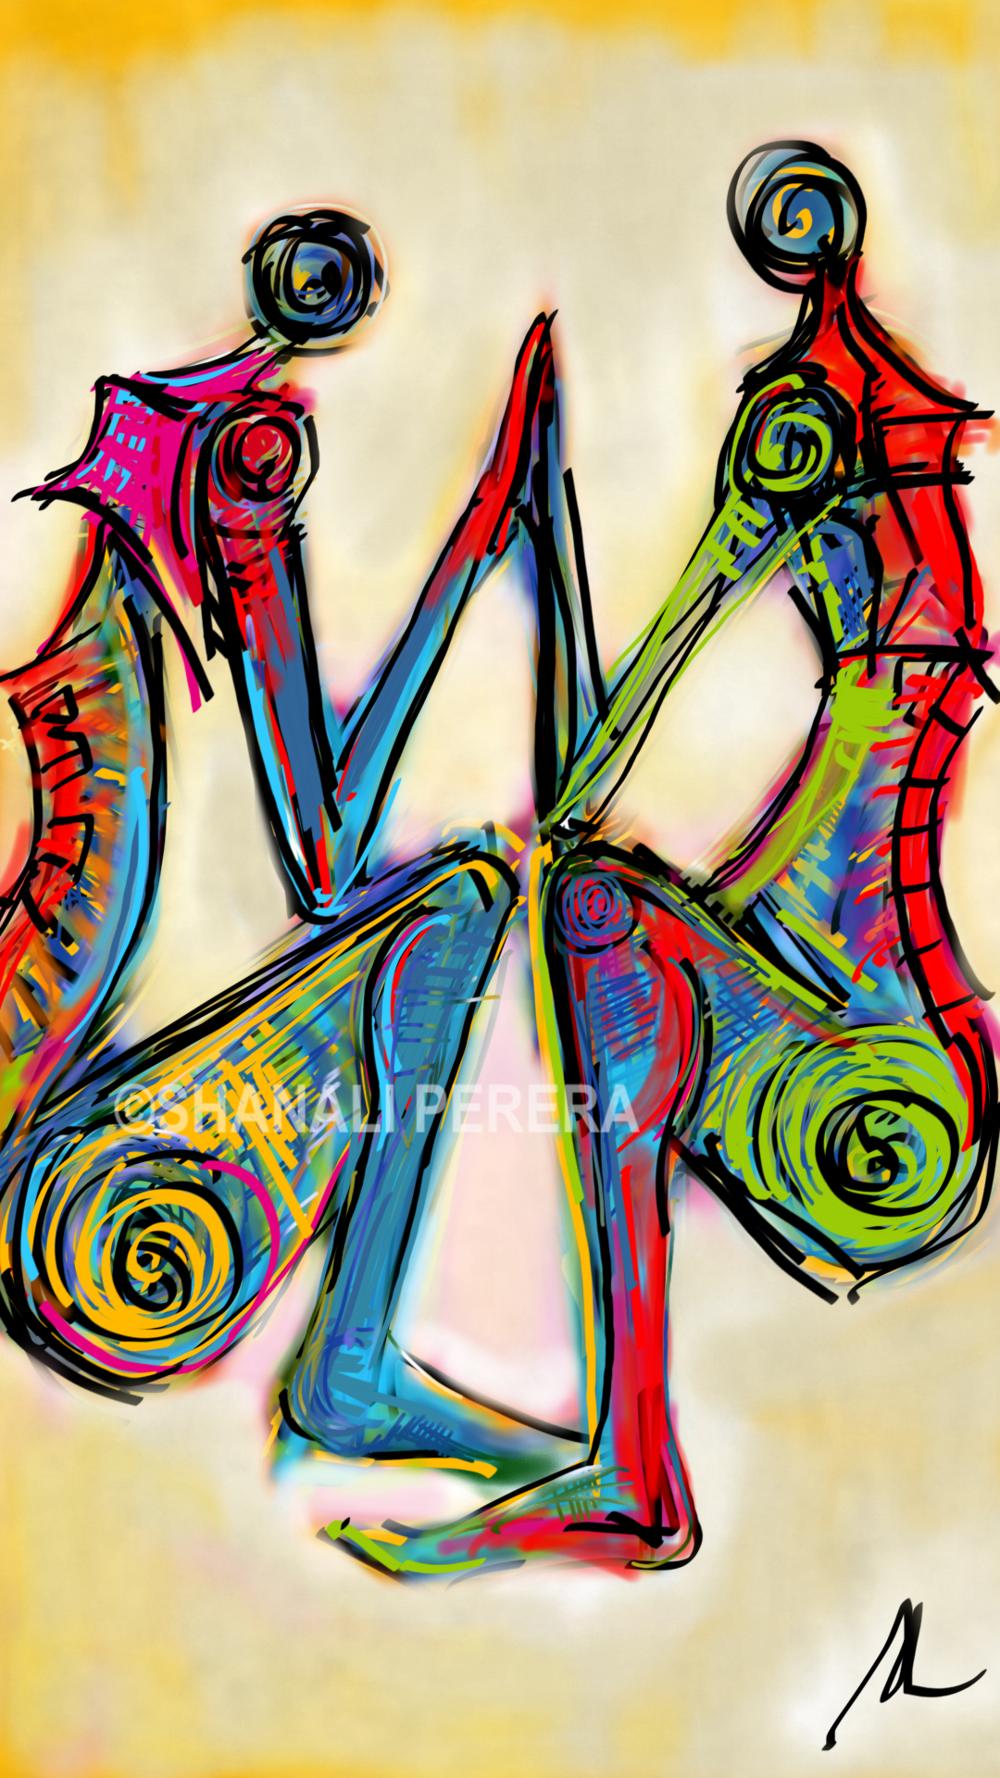 sketch-1516512042722.png